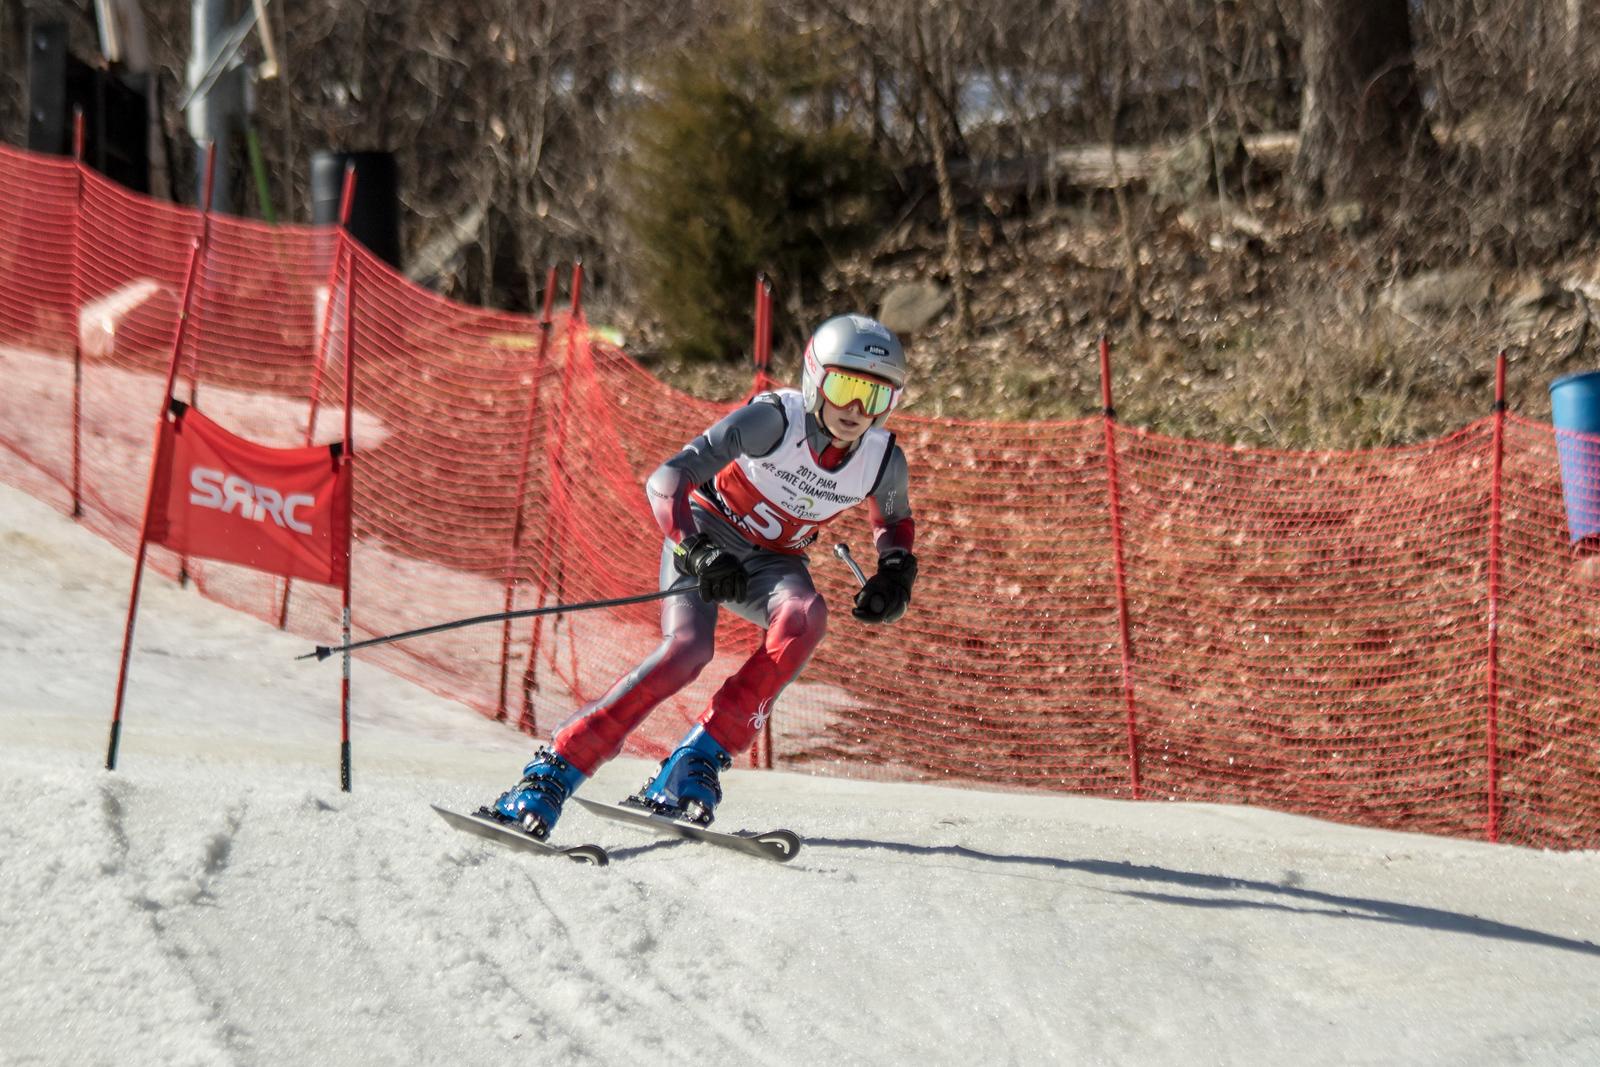 Aiden Wandel No.51 (WPRC) 2017 PARA U12 State Championships at Roundtop Mountain Resort